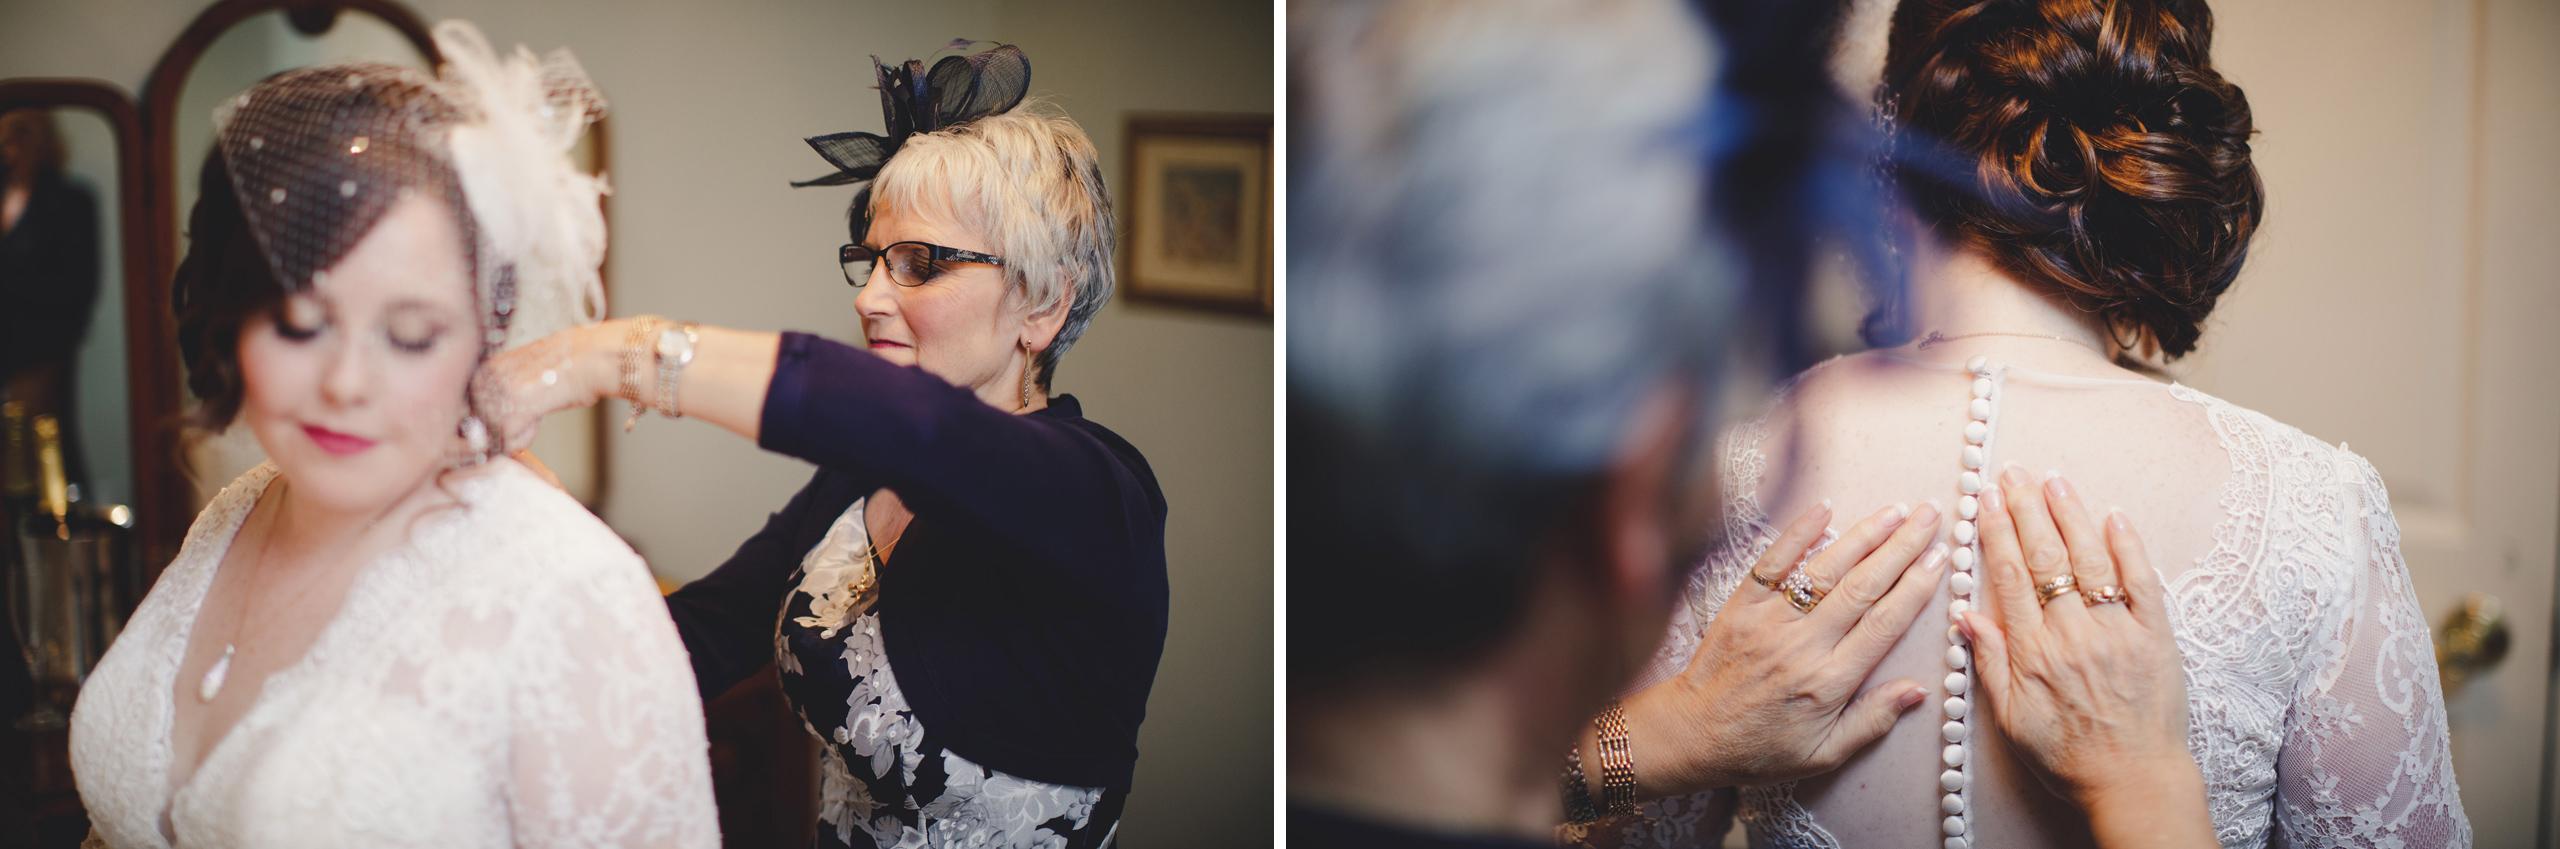 bridal suite ancaster mill wedding niagara photographer